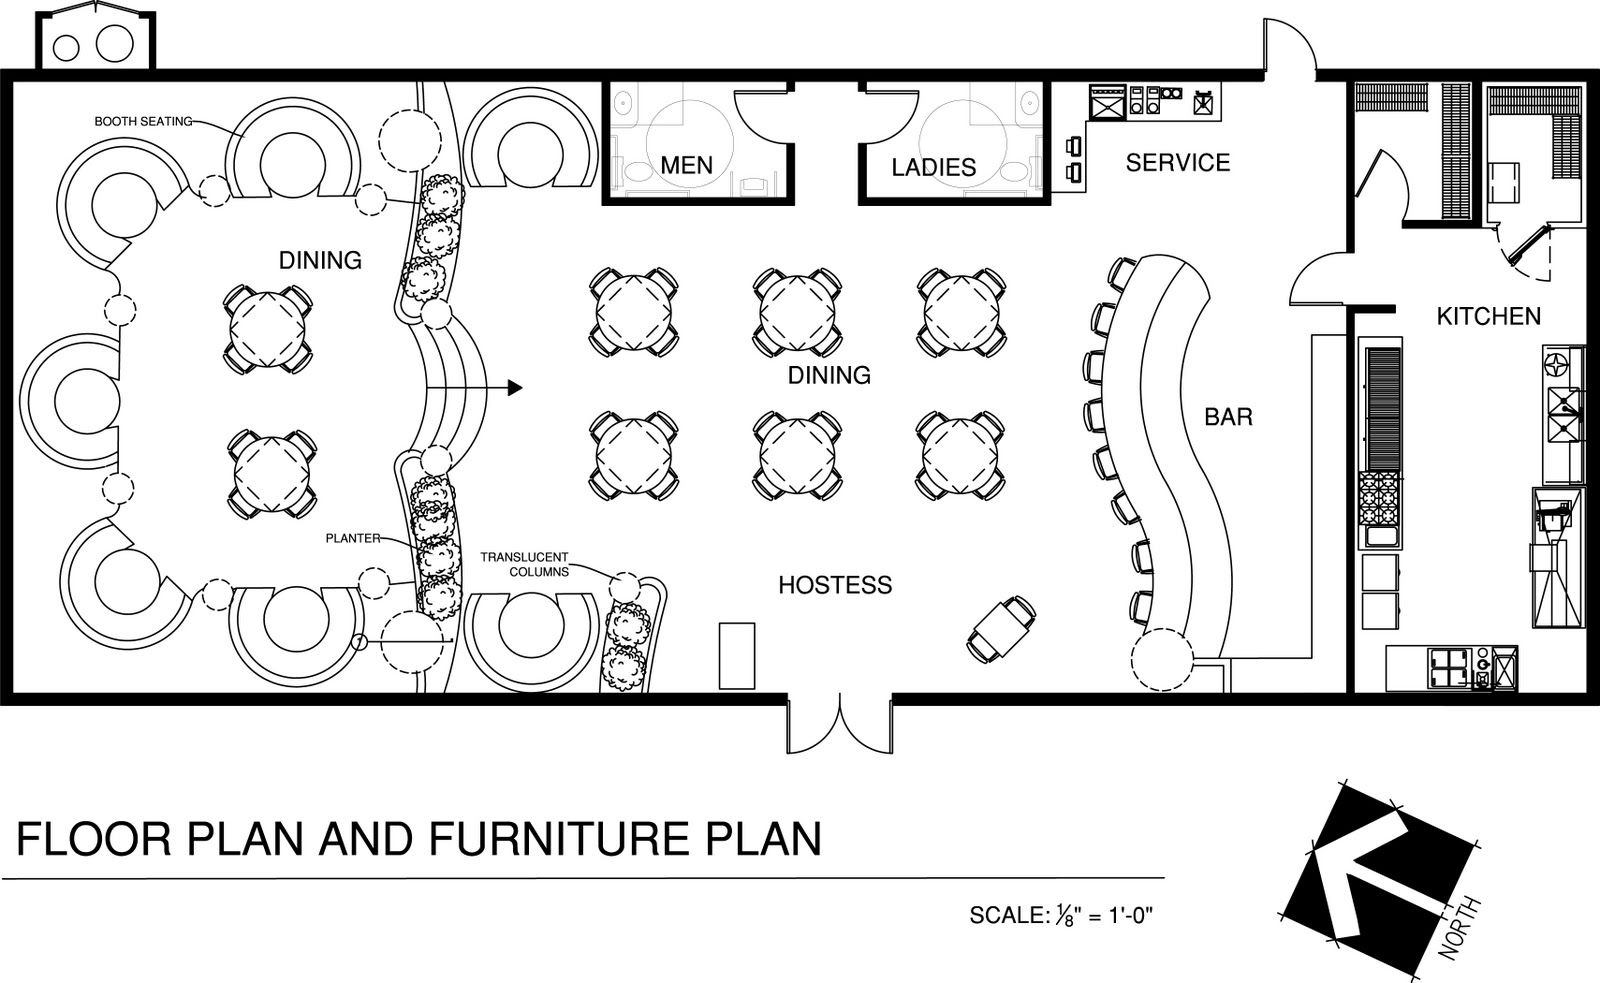 Id 3335 Restaurant Floor Plan081610 Floorplan Yerlesim Plani Isyeri Restoran